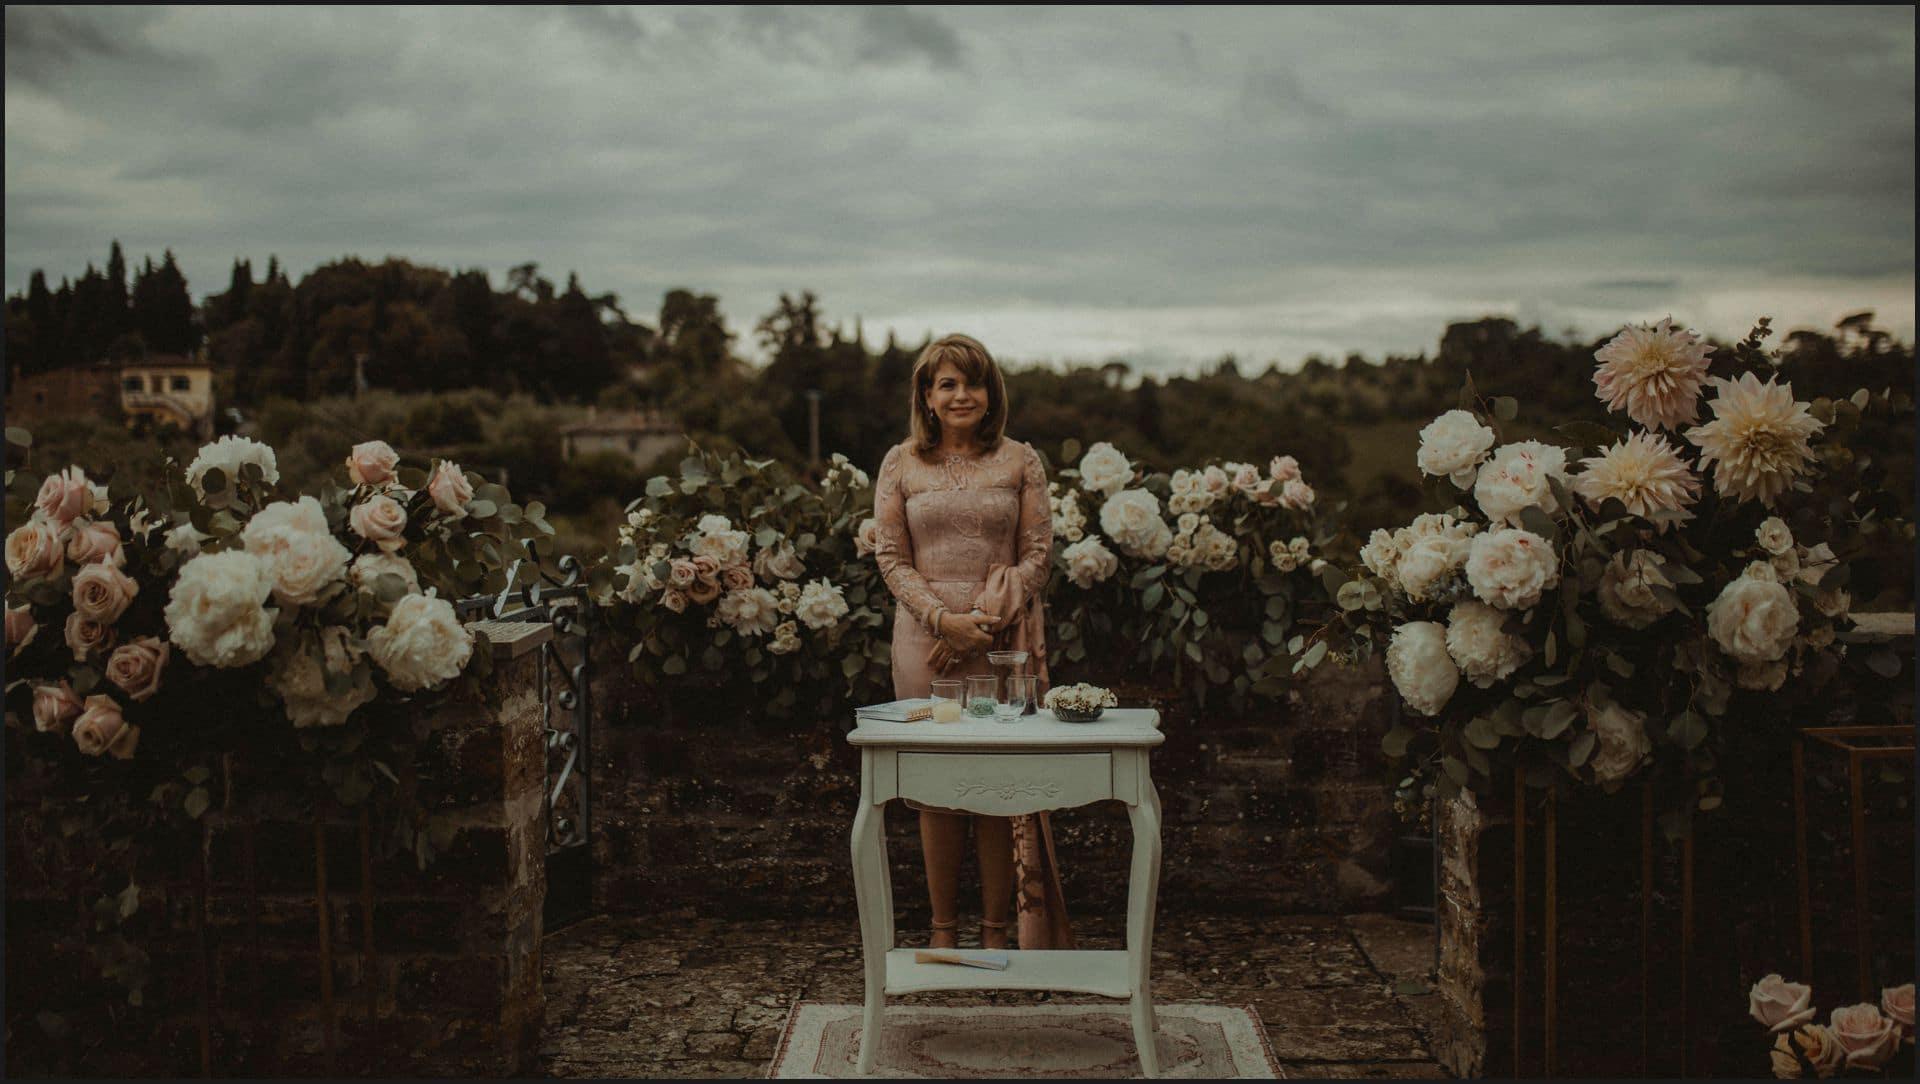 tuscany, destination wedding, chianti, ceremony, celebrant